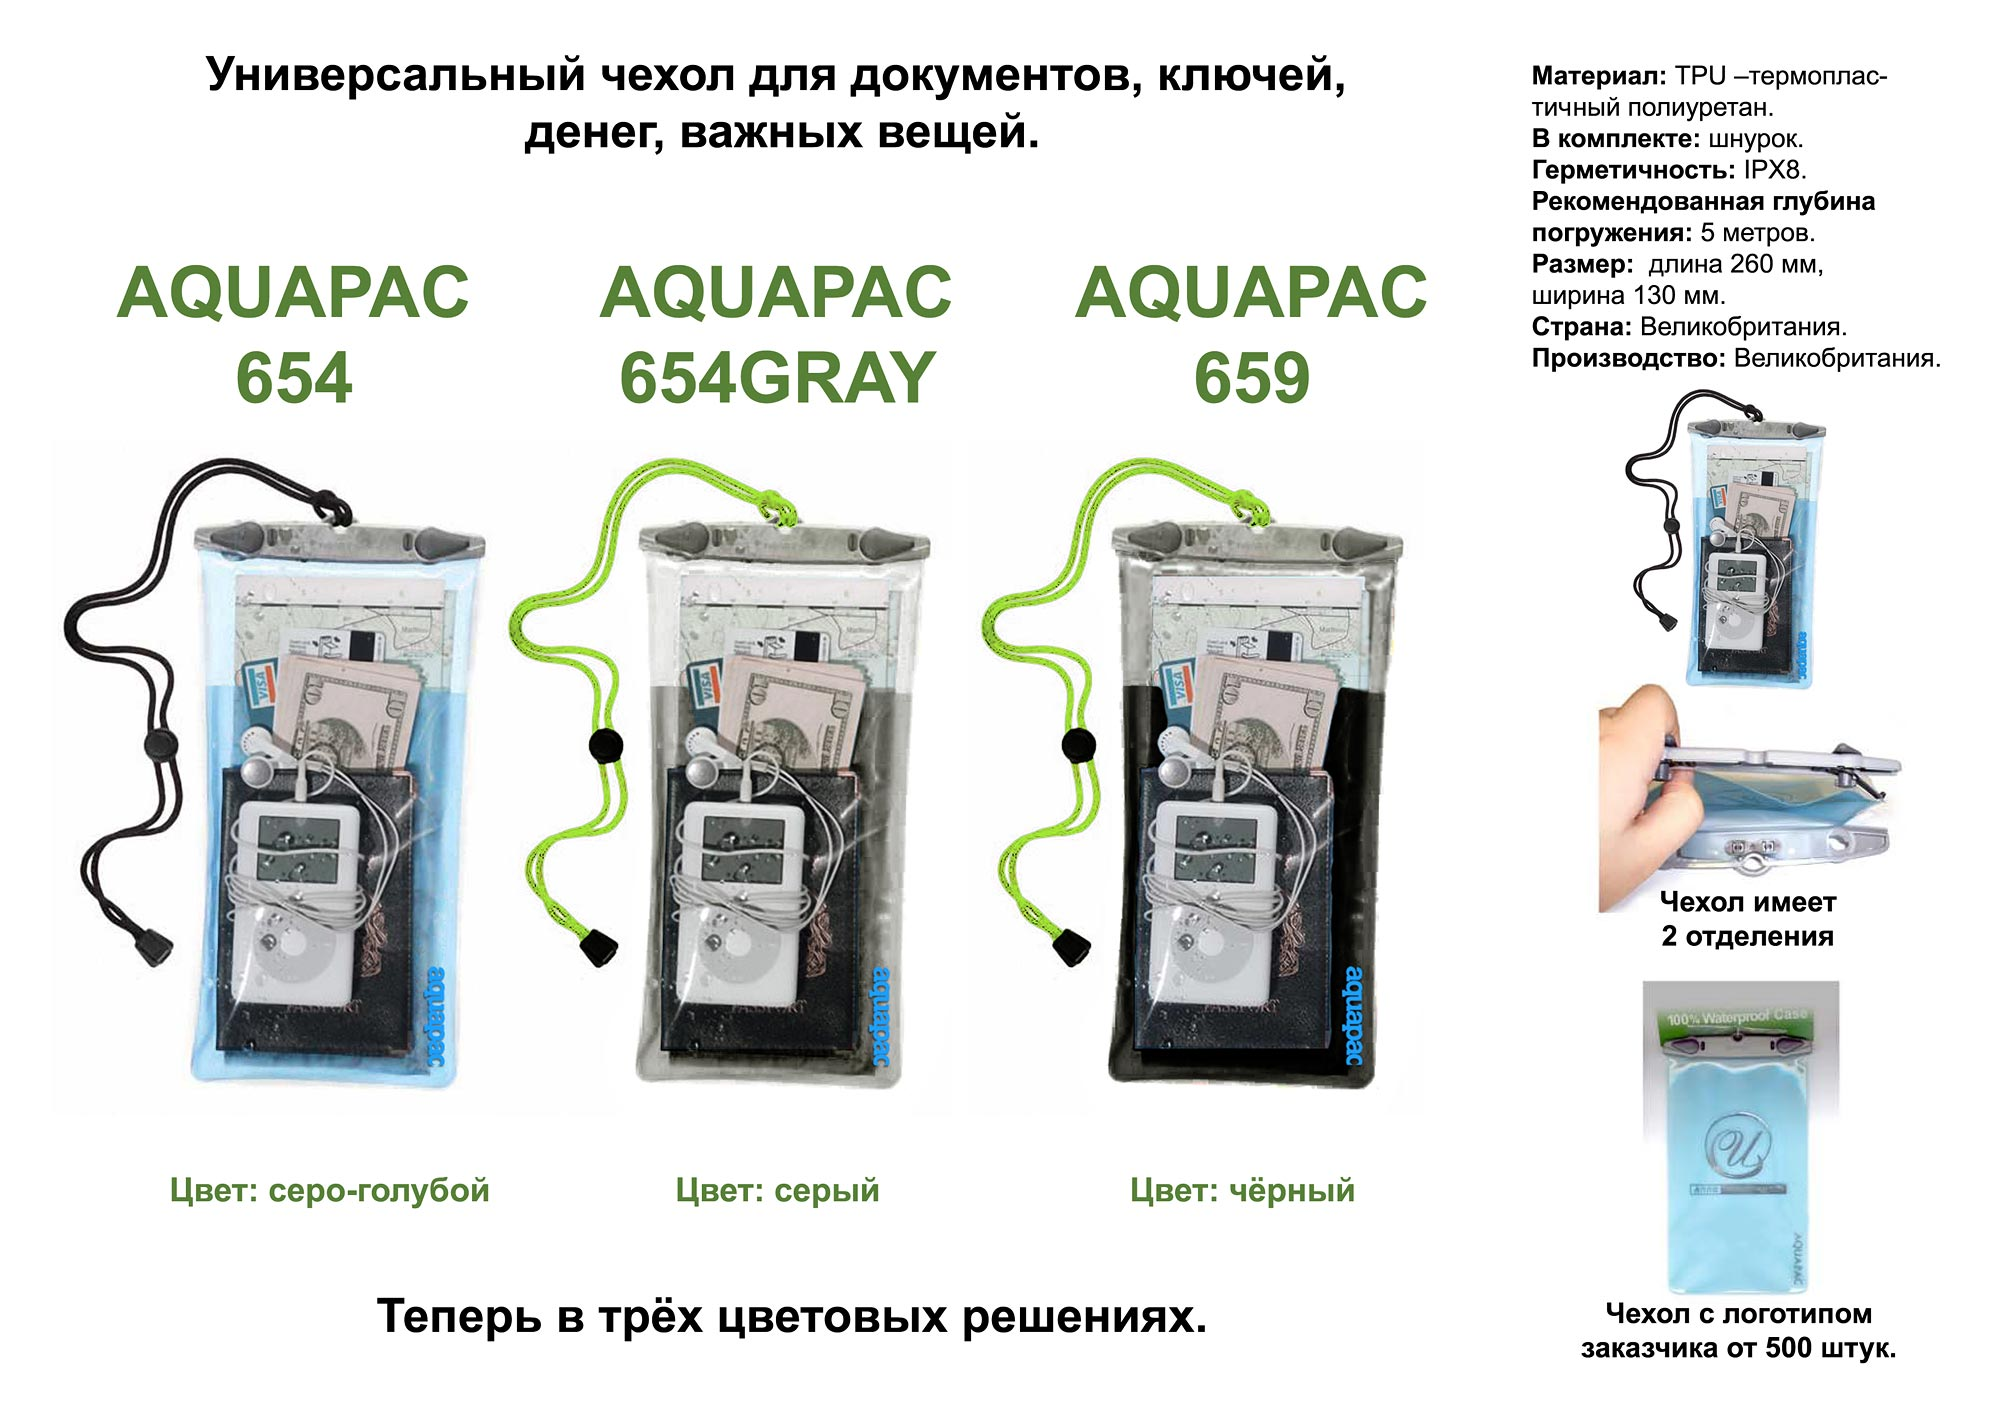 Водонепроницаемый чехол для документов - Aquapac 654. Aquapac - №1 в мире водонепроницаемых чехлов и сумок. Фото 2